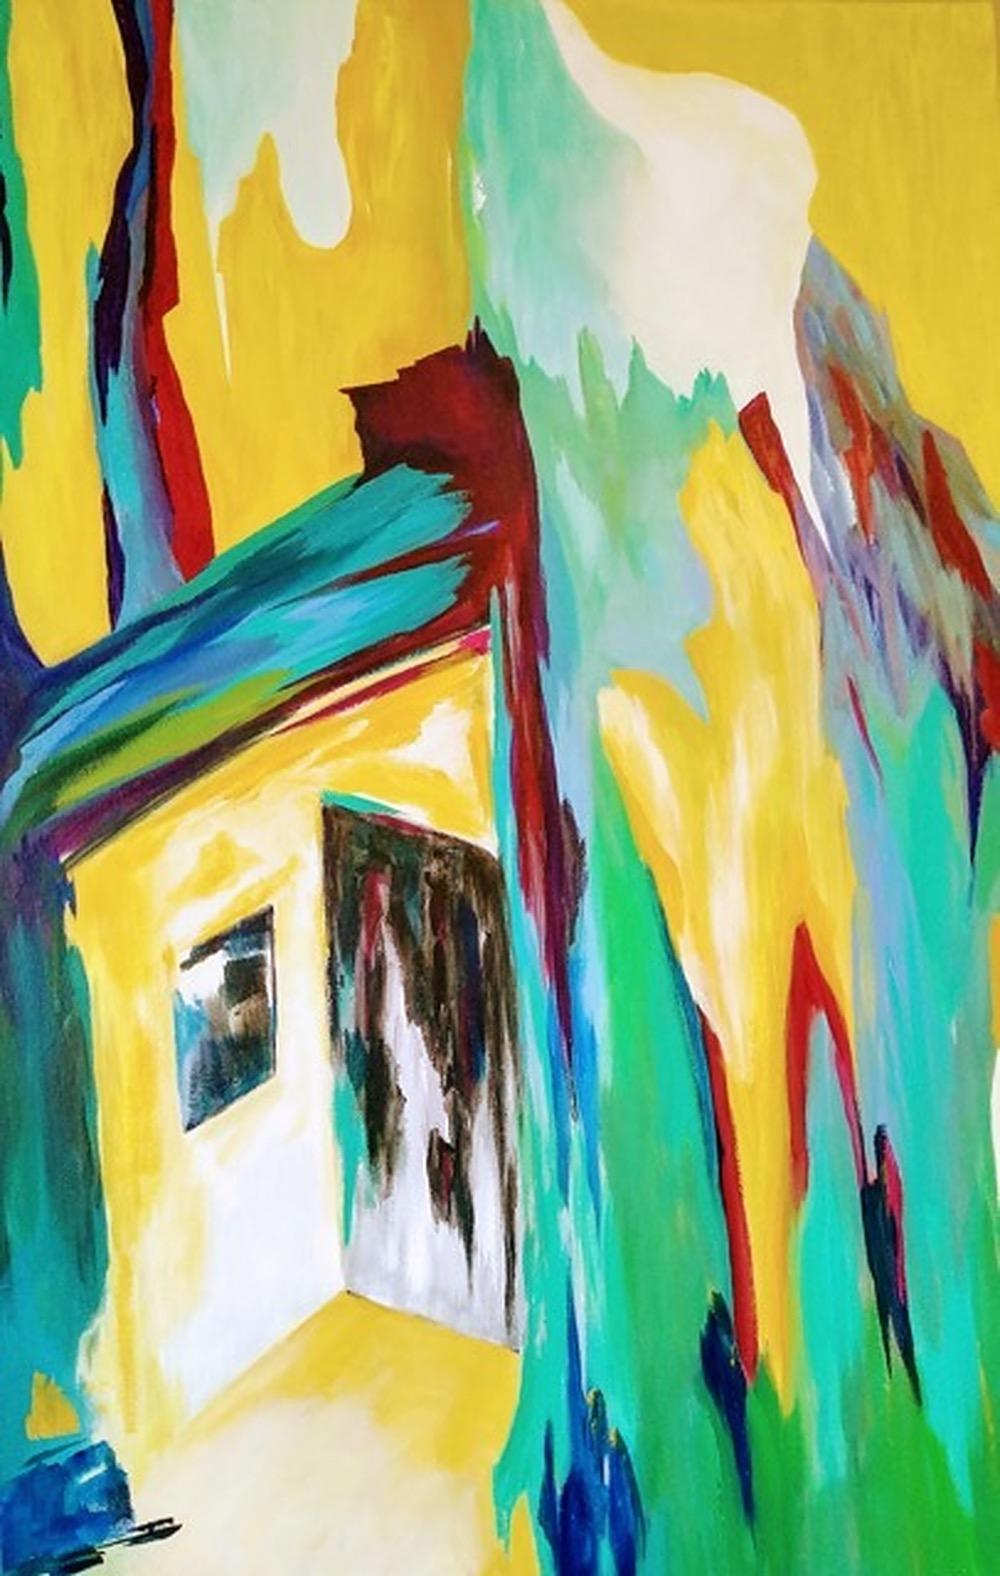 The Door by Helene Strebel | ArtworkNetwork.com